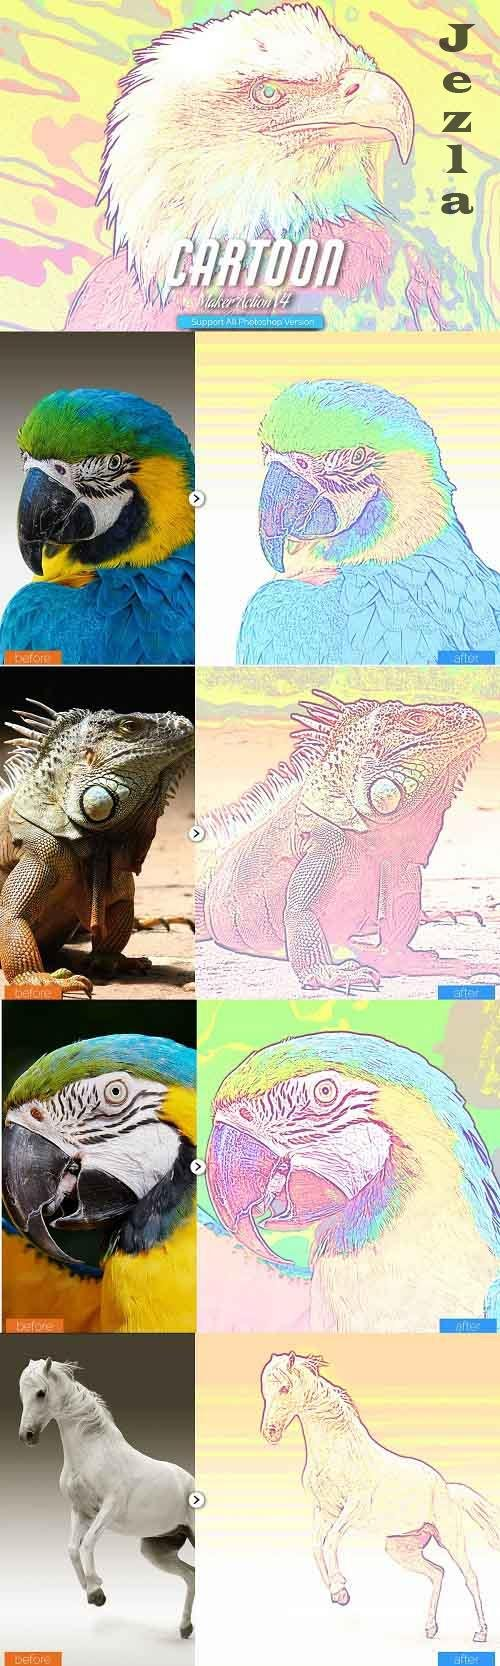 Cartoon Maker Photoshop Action V4 - 5457161